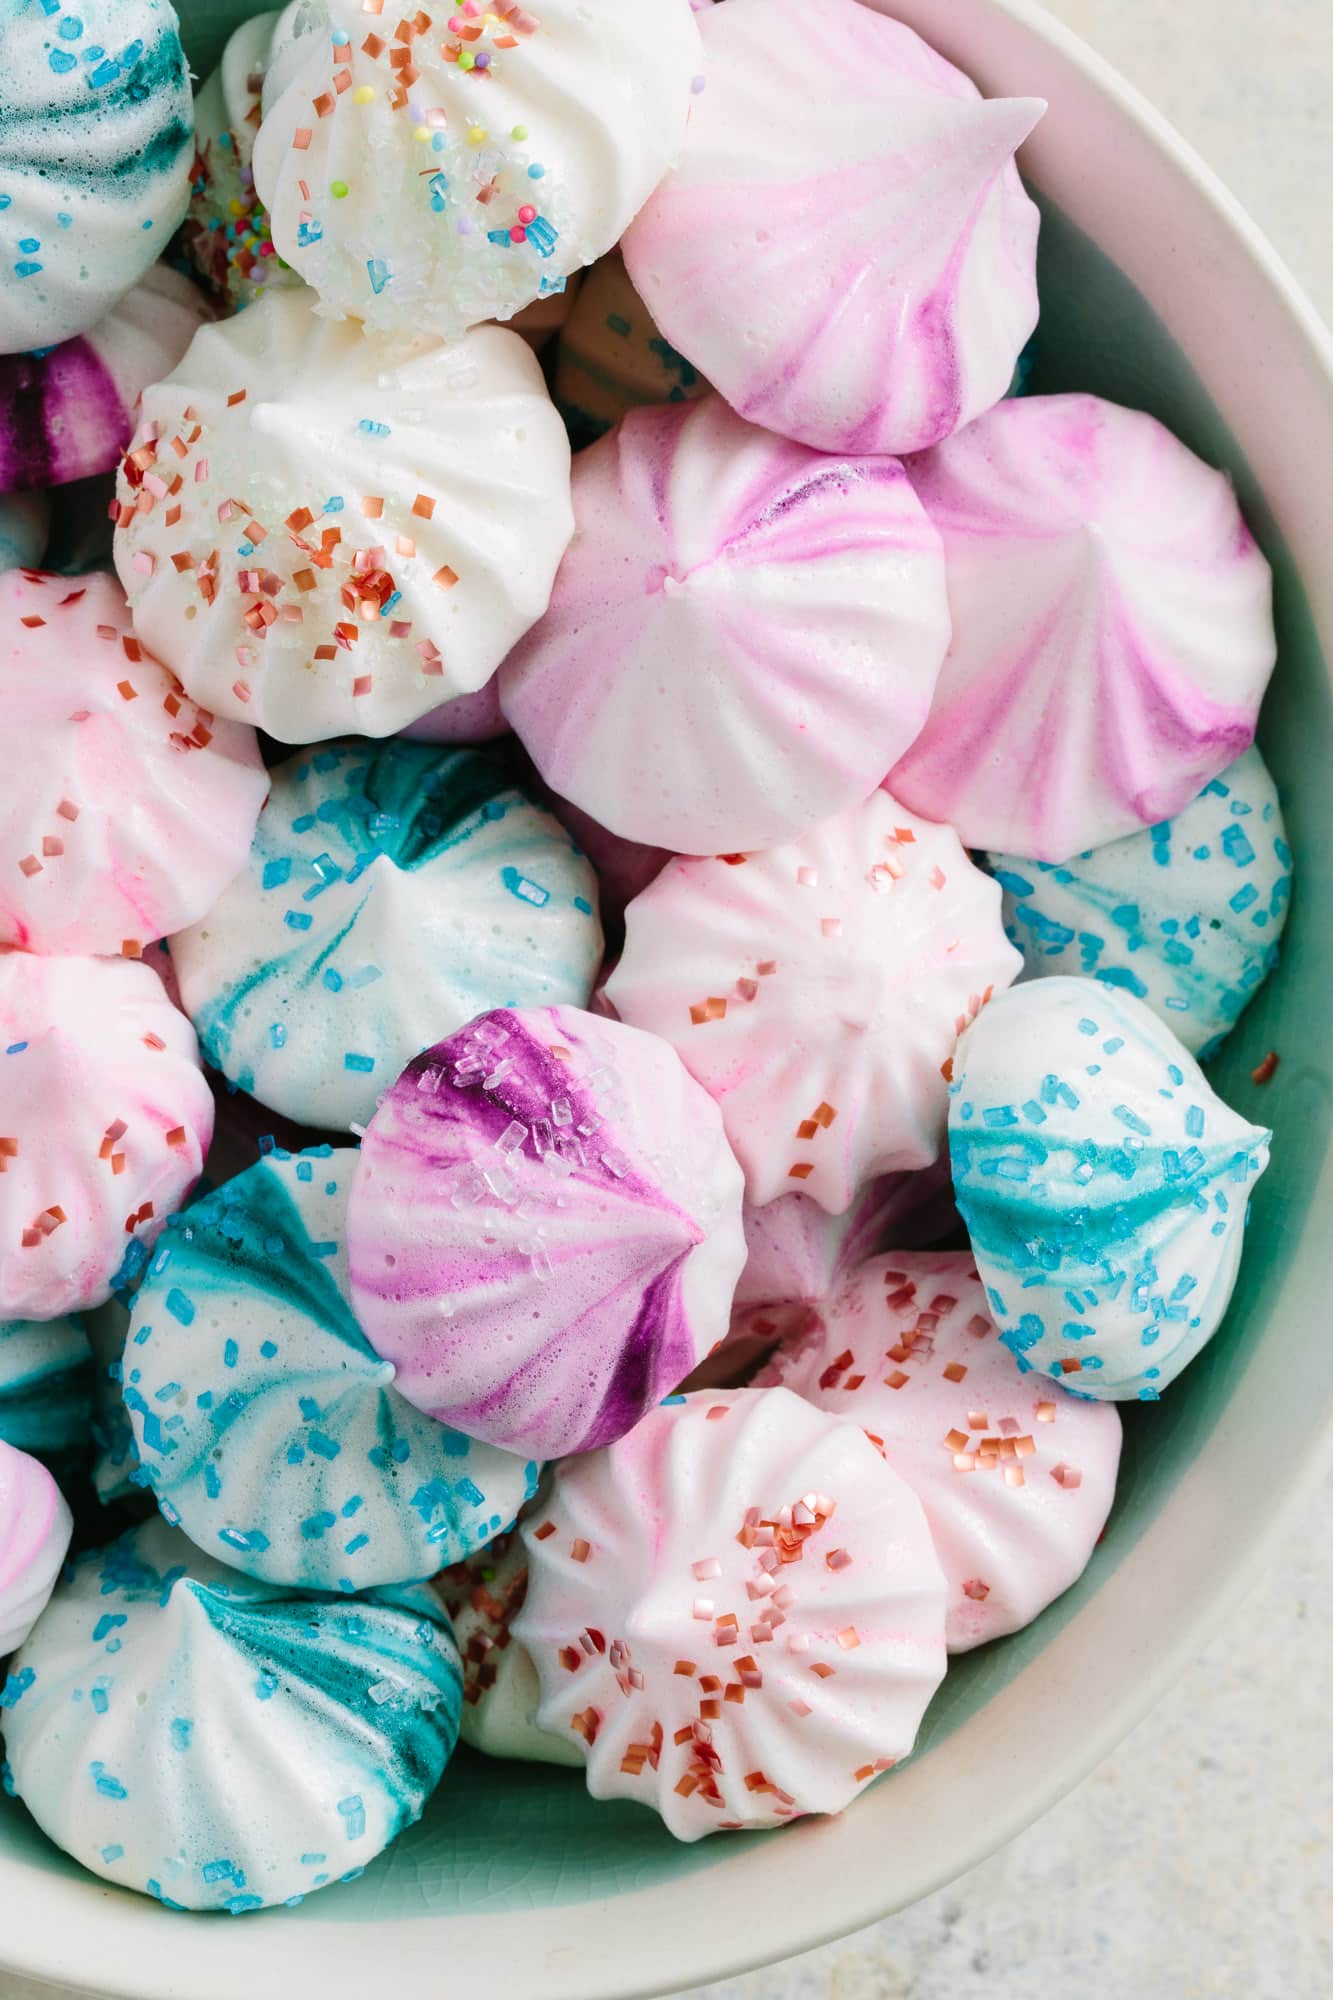 How To Make Vegan Meringue Cookies